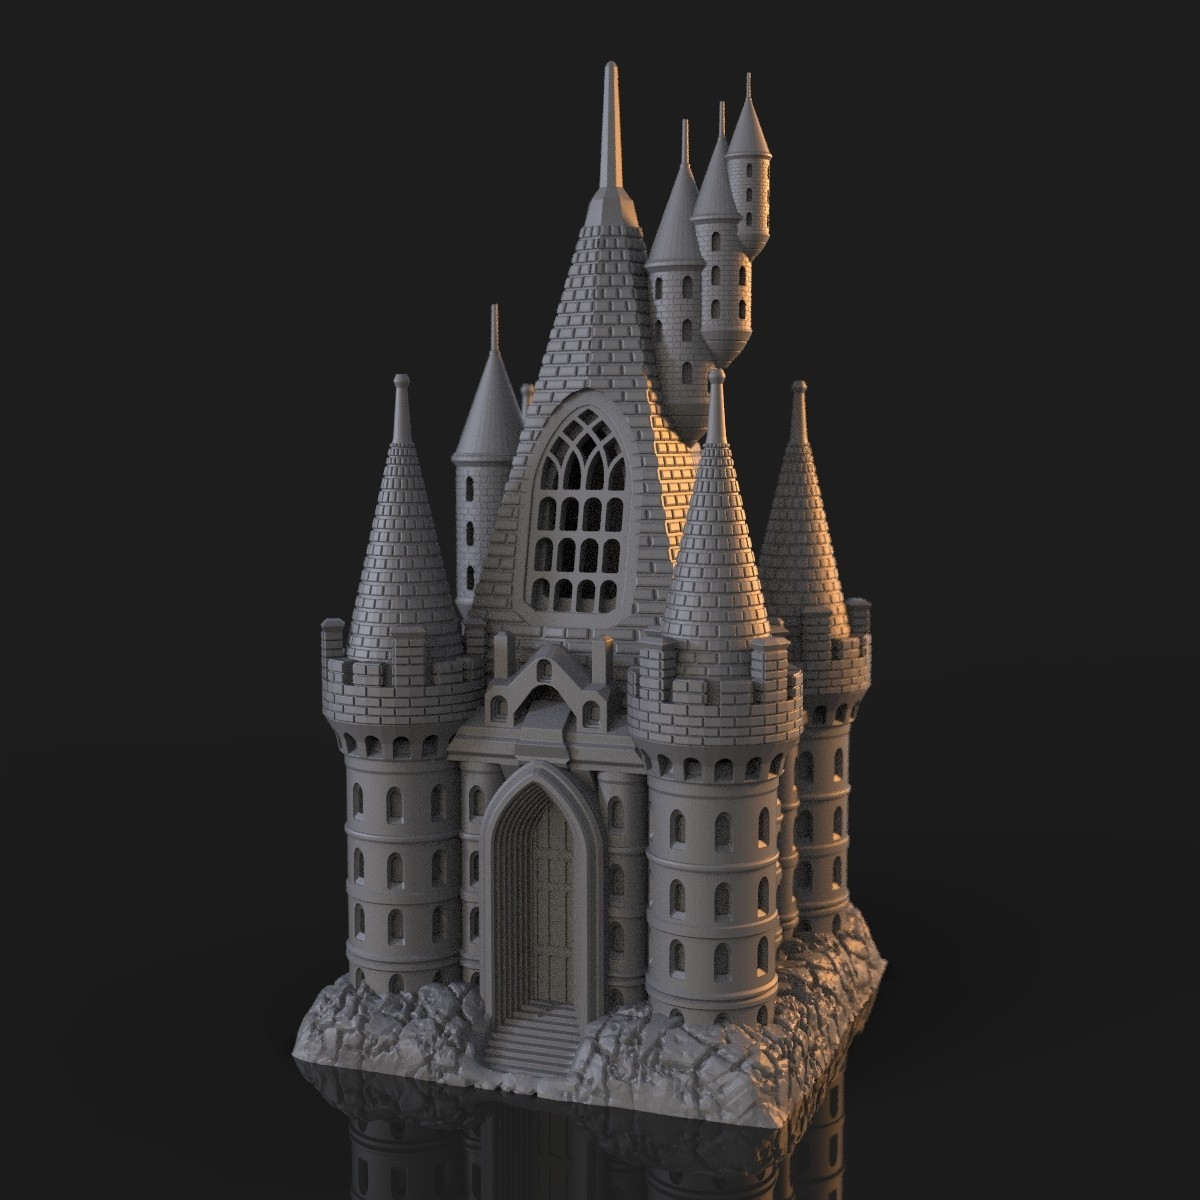 6.jpg Download OBJ file The Five Tower Hall • 3D printable template, tolgaaxu